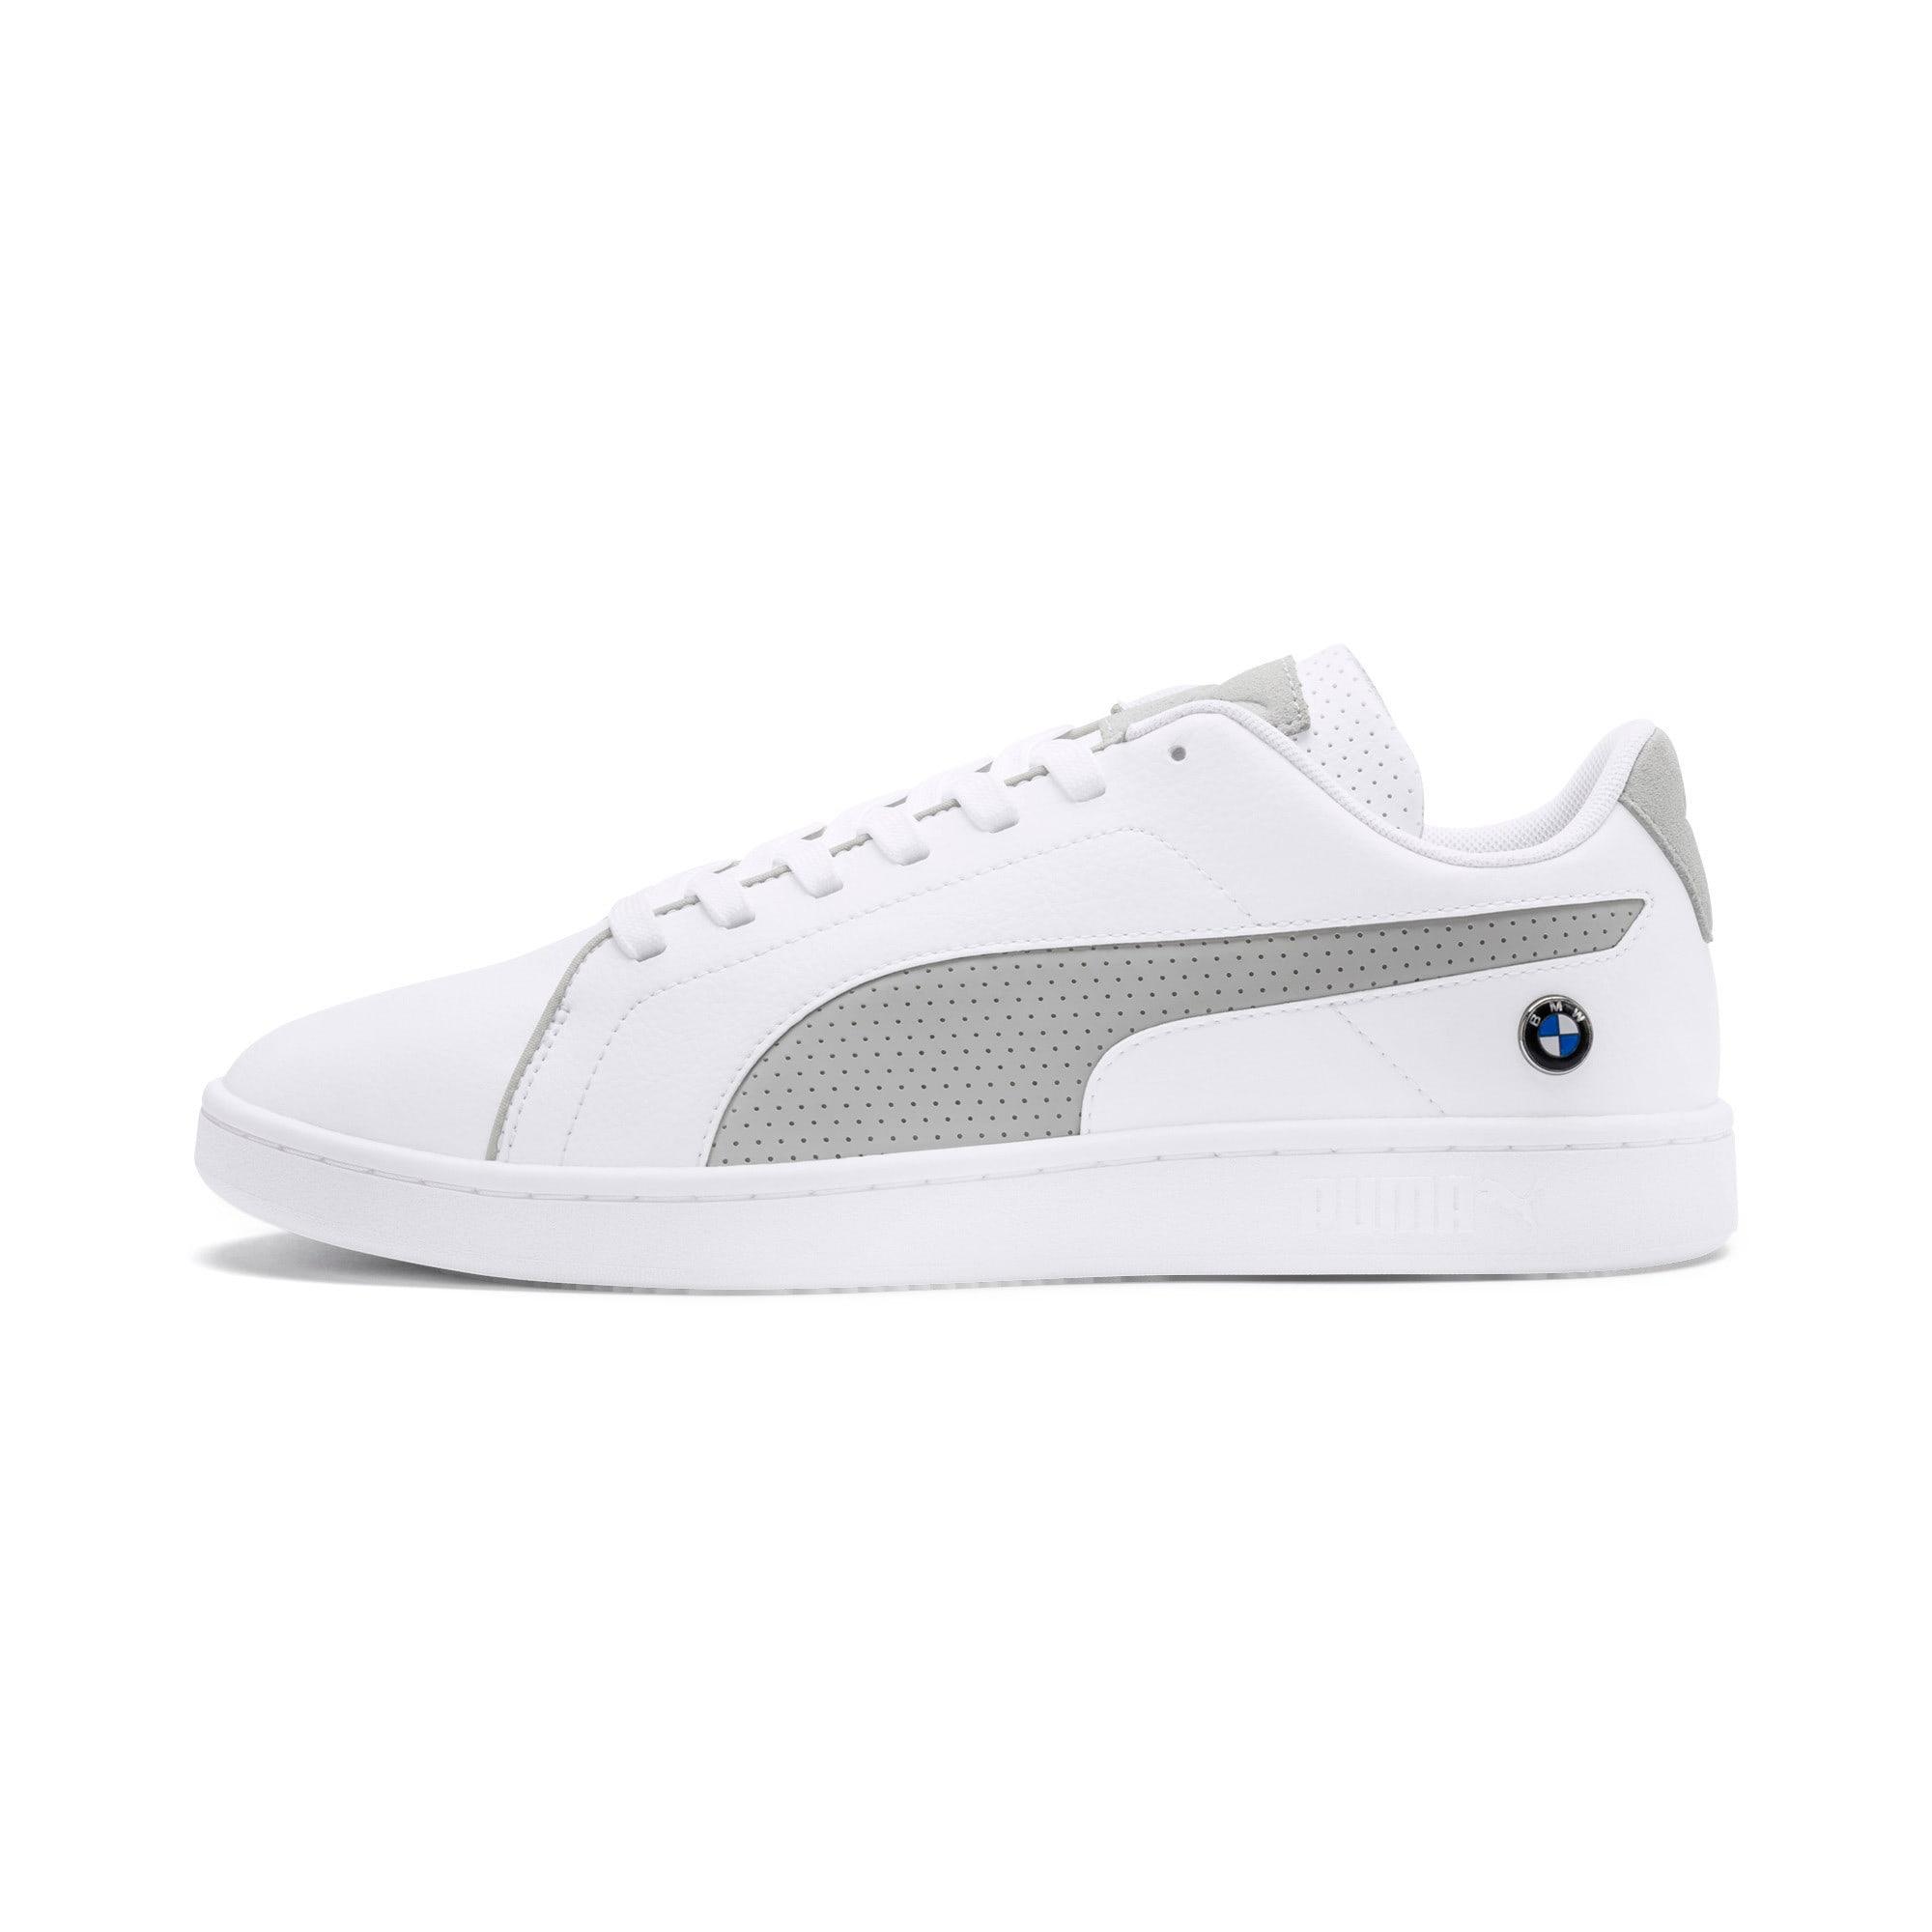 Thumbnail 1 of BMW M Motorsport Smash v2 Sneakers, Puma White-Gray Violet, medium